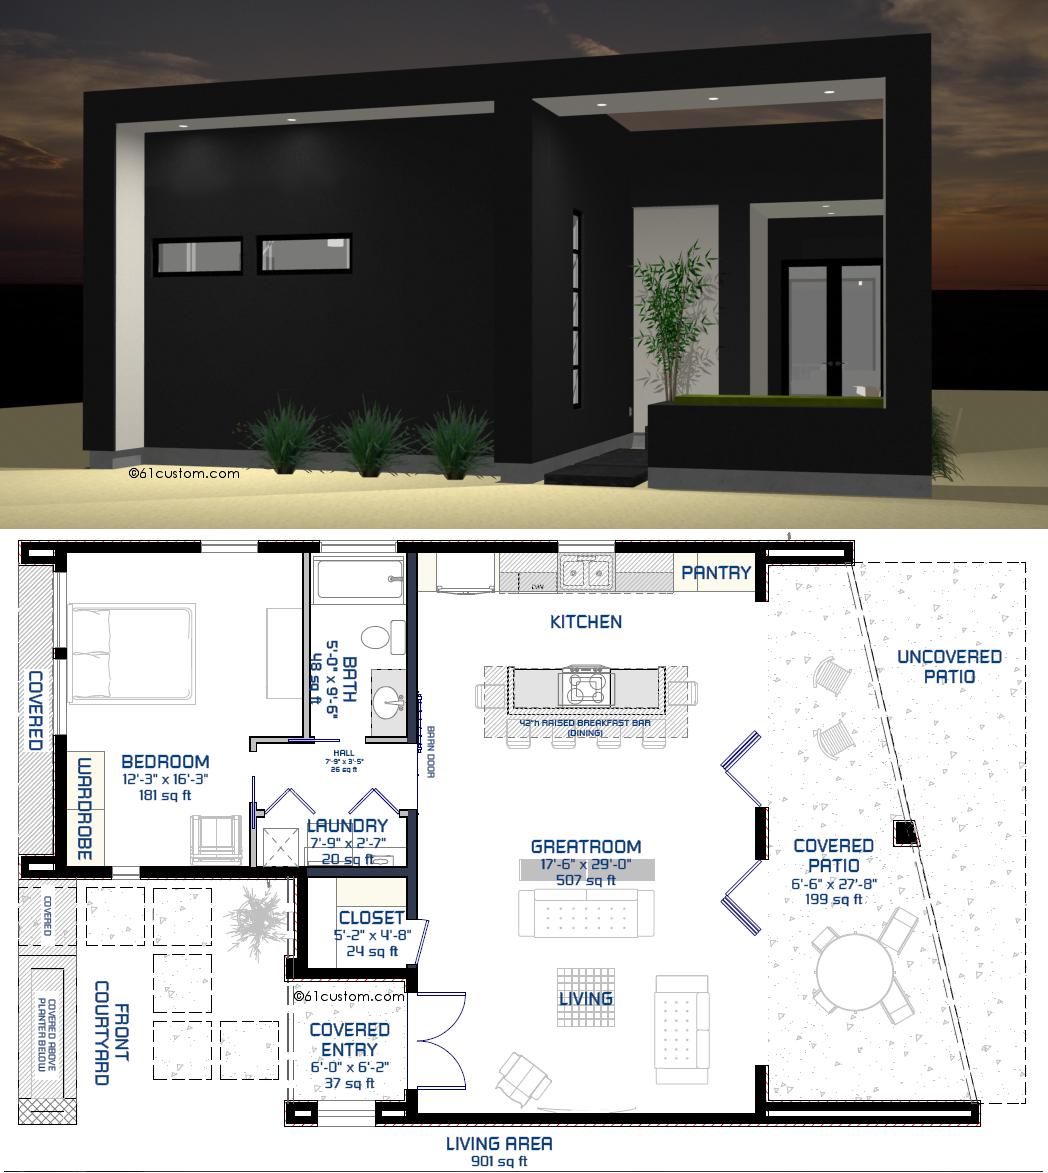 Studio900 Small Courtyard House Plan Small Modern House Plans